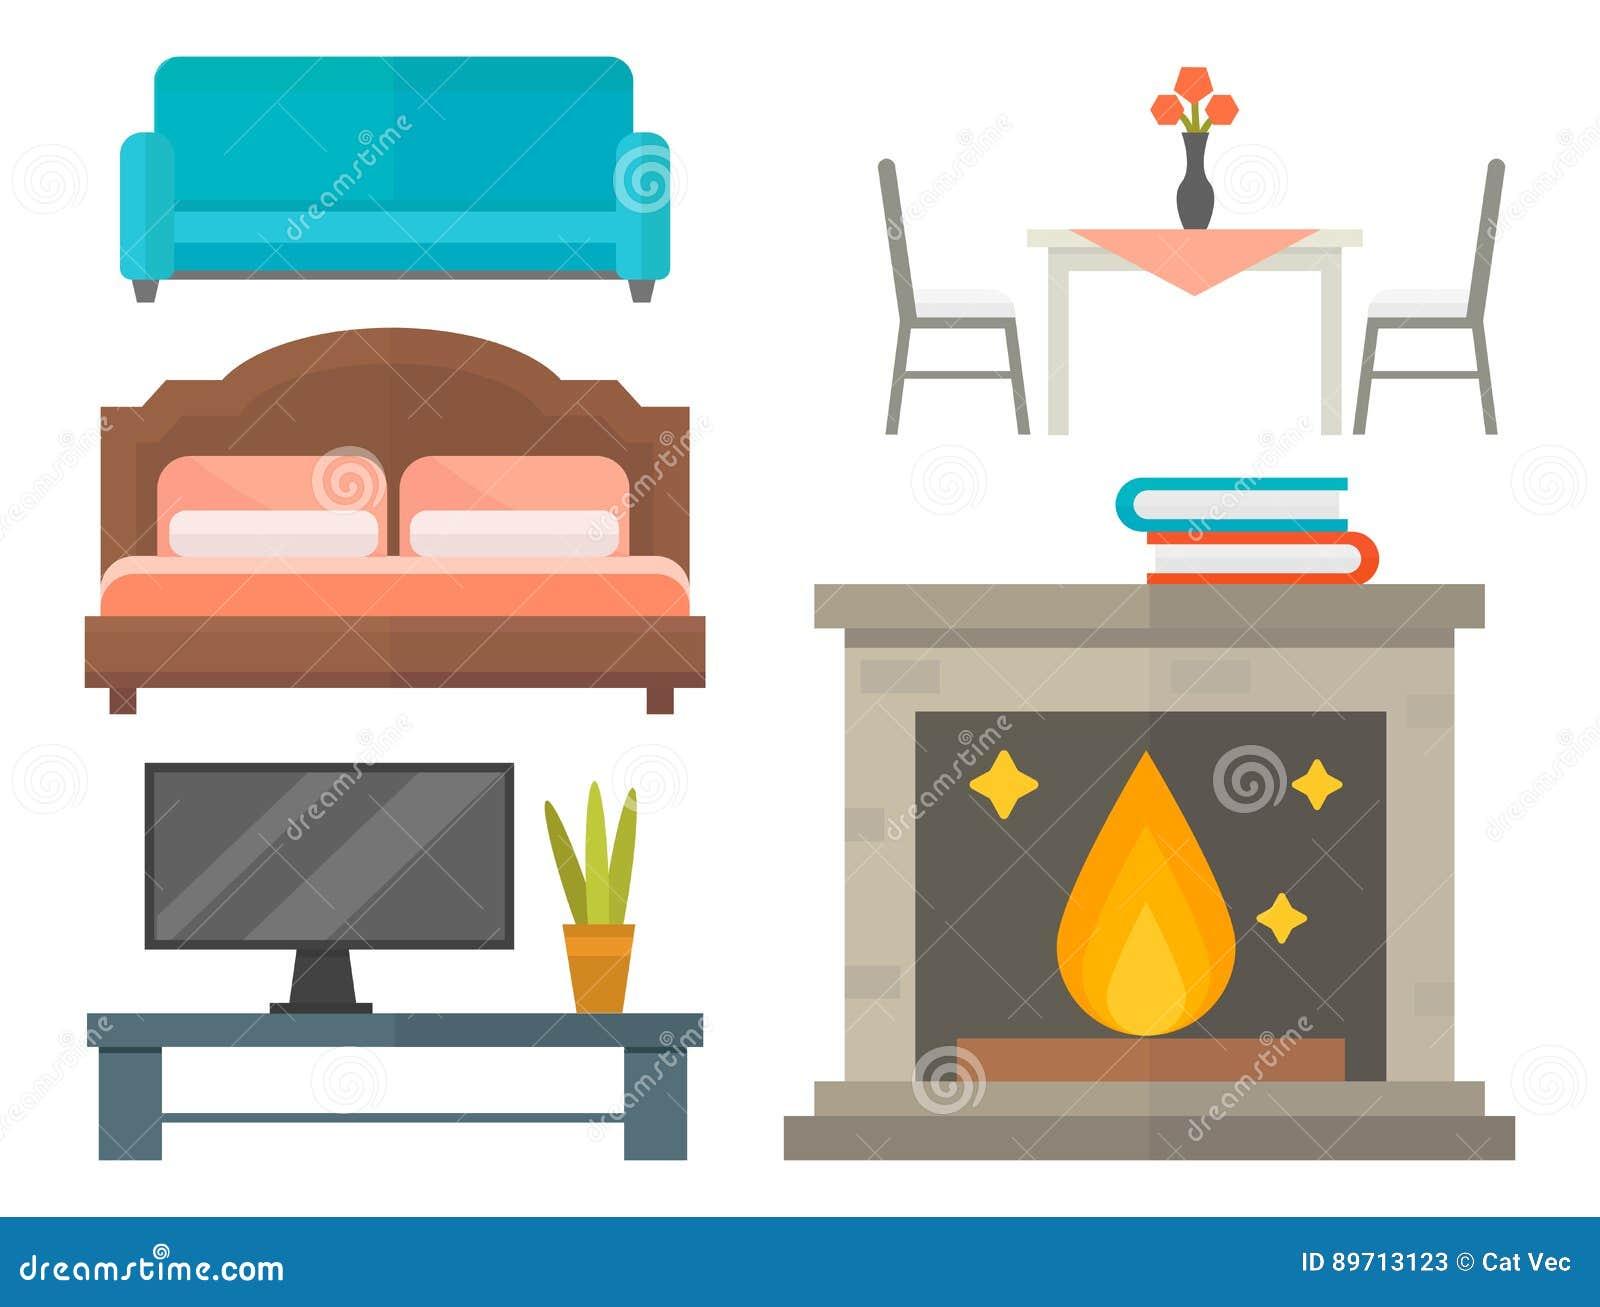 Furniture Home Decor Icon Set Indoor Cabinet Interior Room